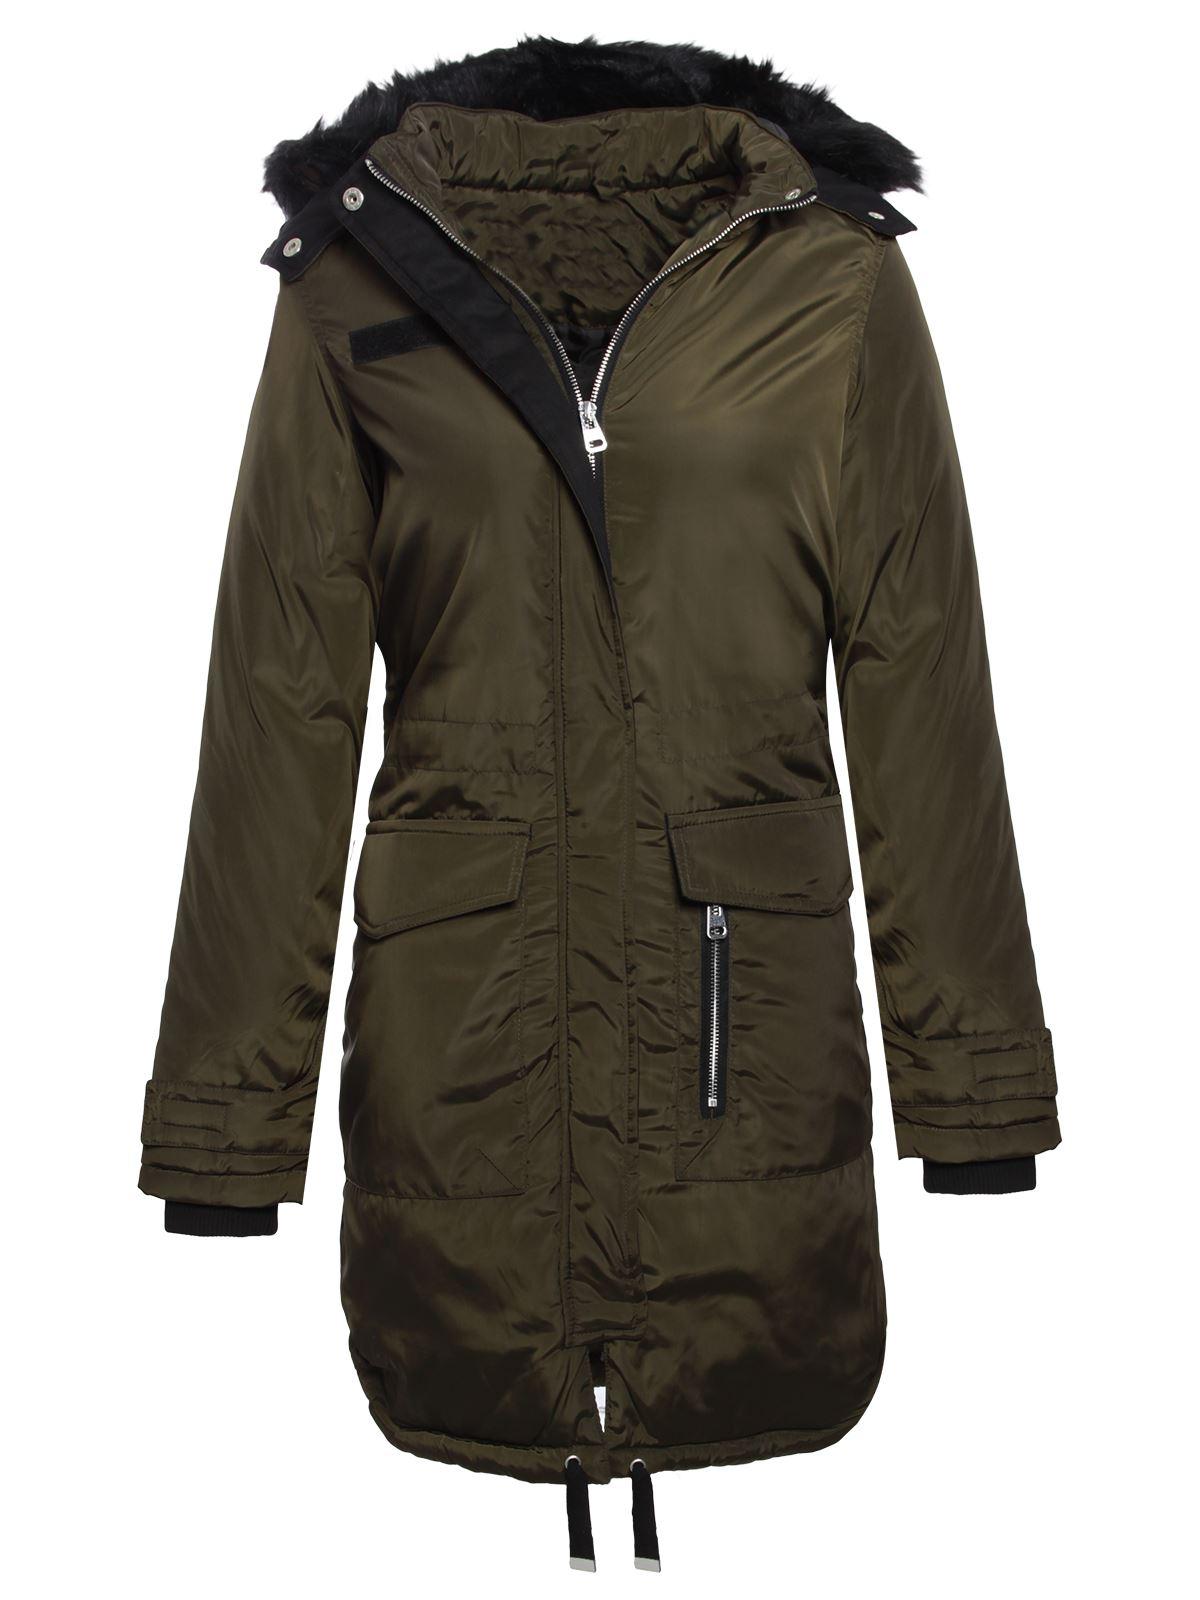 Brave Soul Womens Ladies Fur Hooded Fishtail Parka Longline Jacket Coat - Brave Soul Womens Ladies Fur Hooded Fishtail Parka Longline Jacket